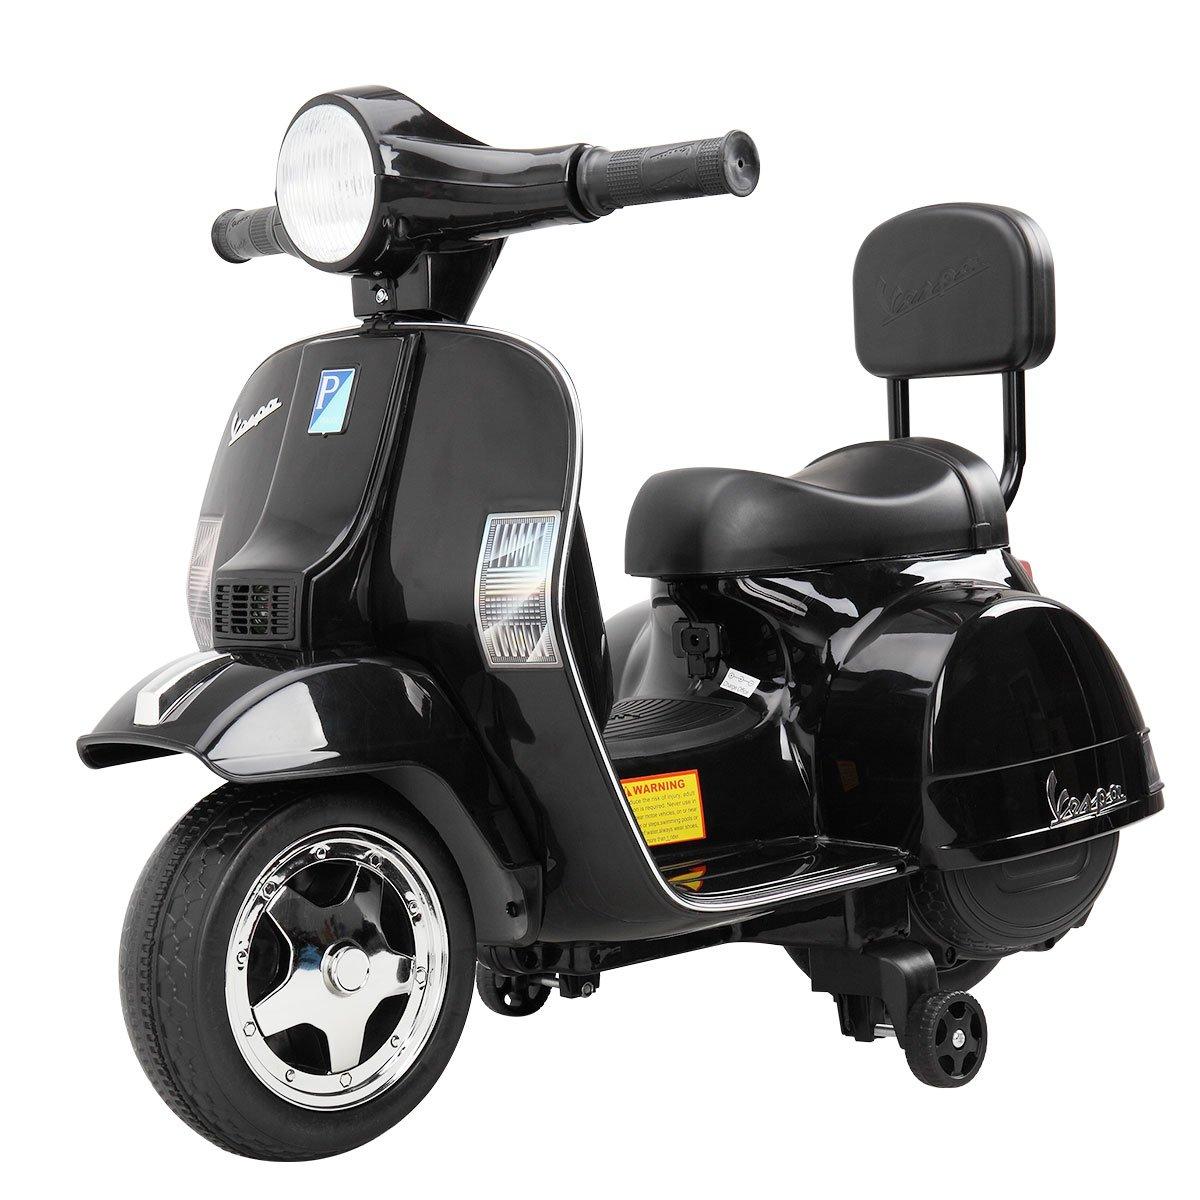 6V Electric mini Kids Motorcycle Ride On TH17U0477 9